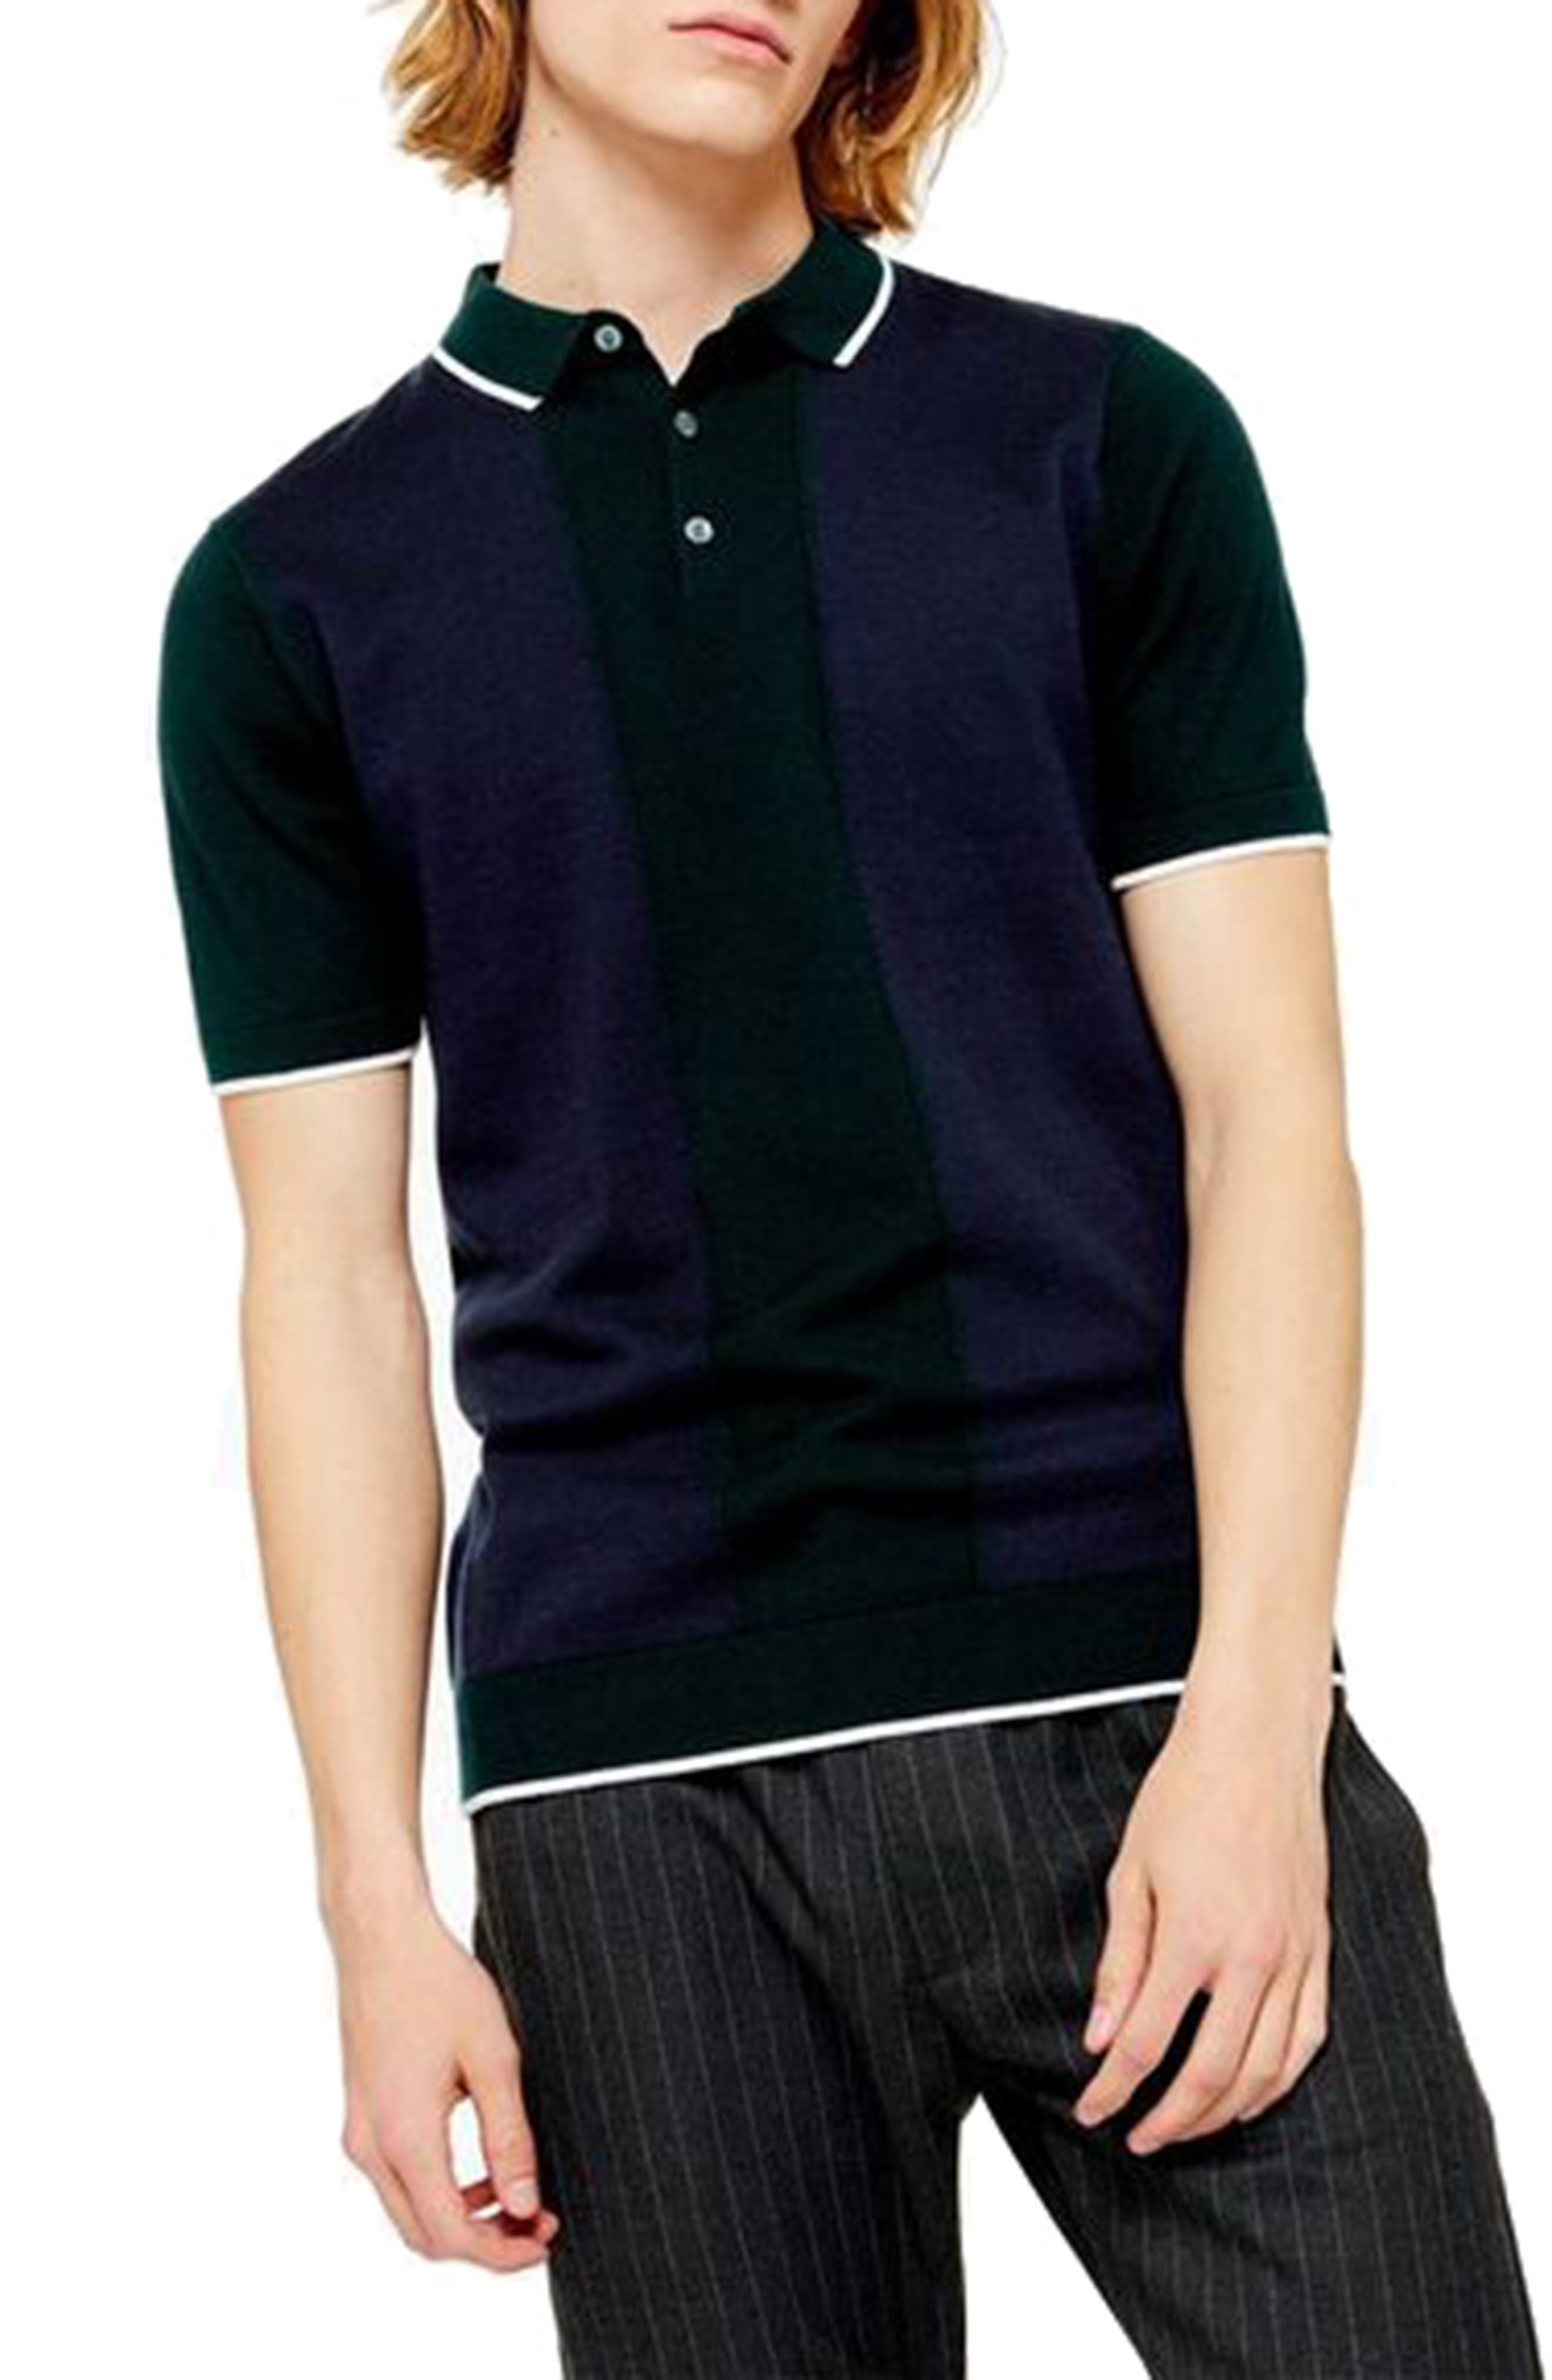 1960s -1970s Men's Clothing Mens Topman Colorblock Sweater Polo $22.50 AT vintagedancer.com